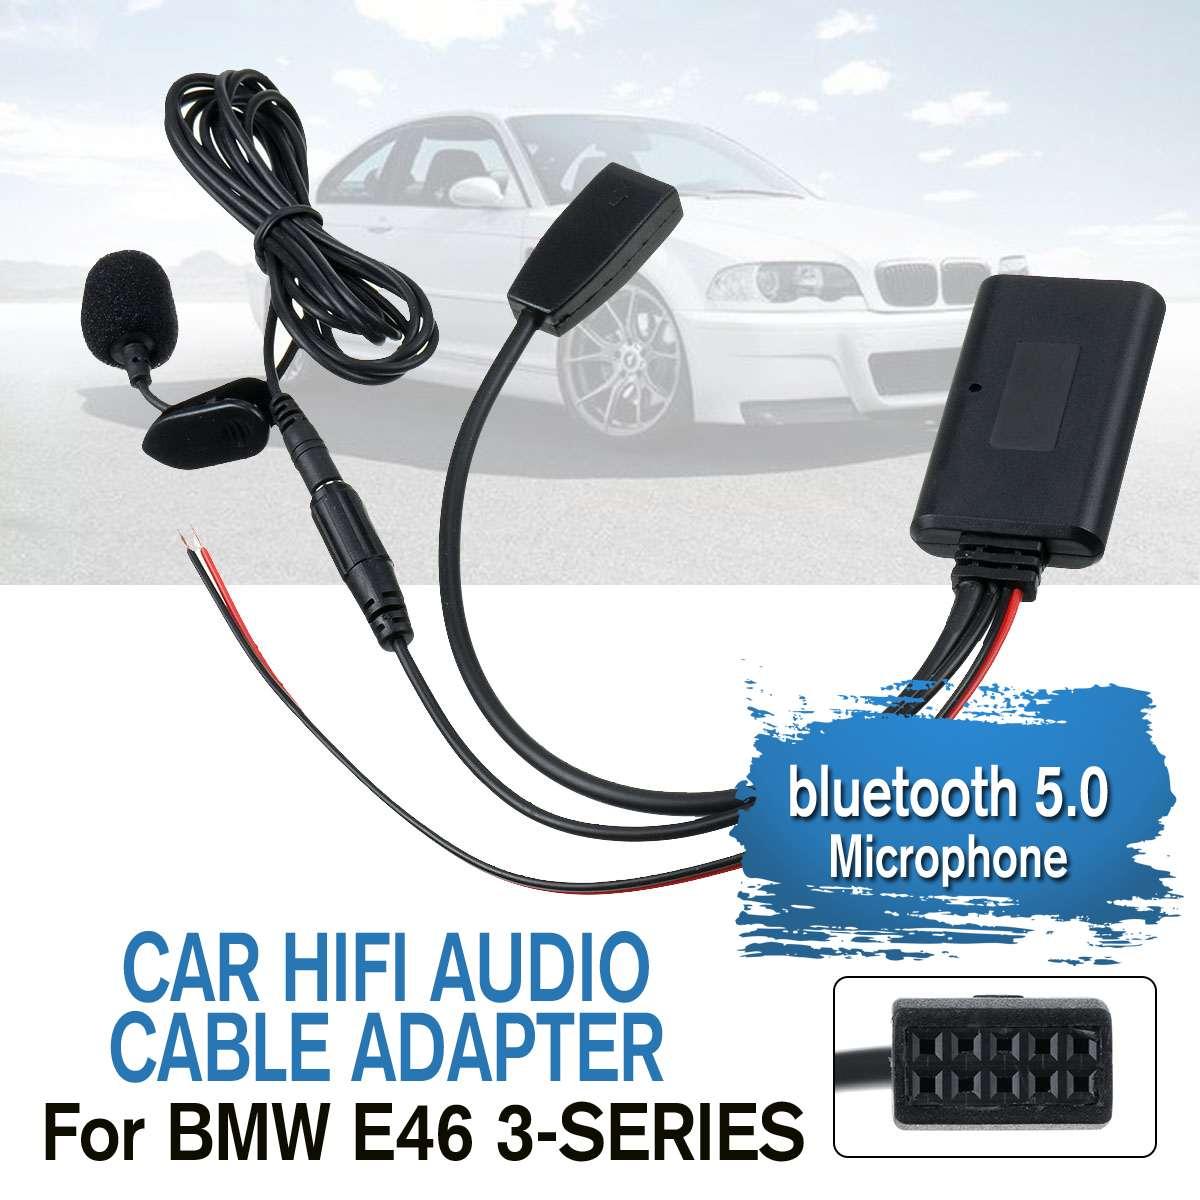 Car Audio Bluetooth 5.0 Music HIFI Cable Adaptor Microphone For BMW E46 3-SERIES 2002-2006